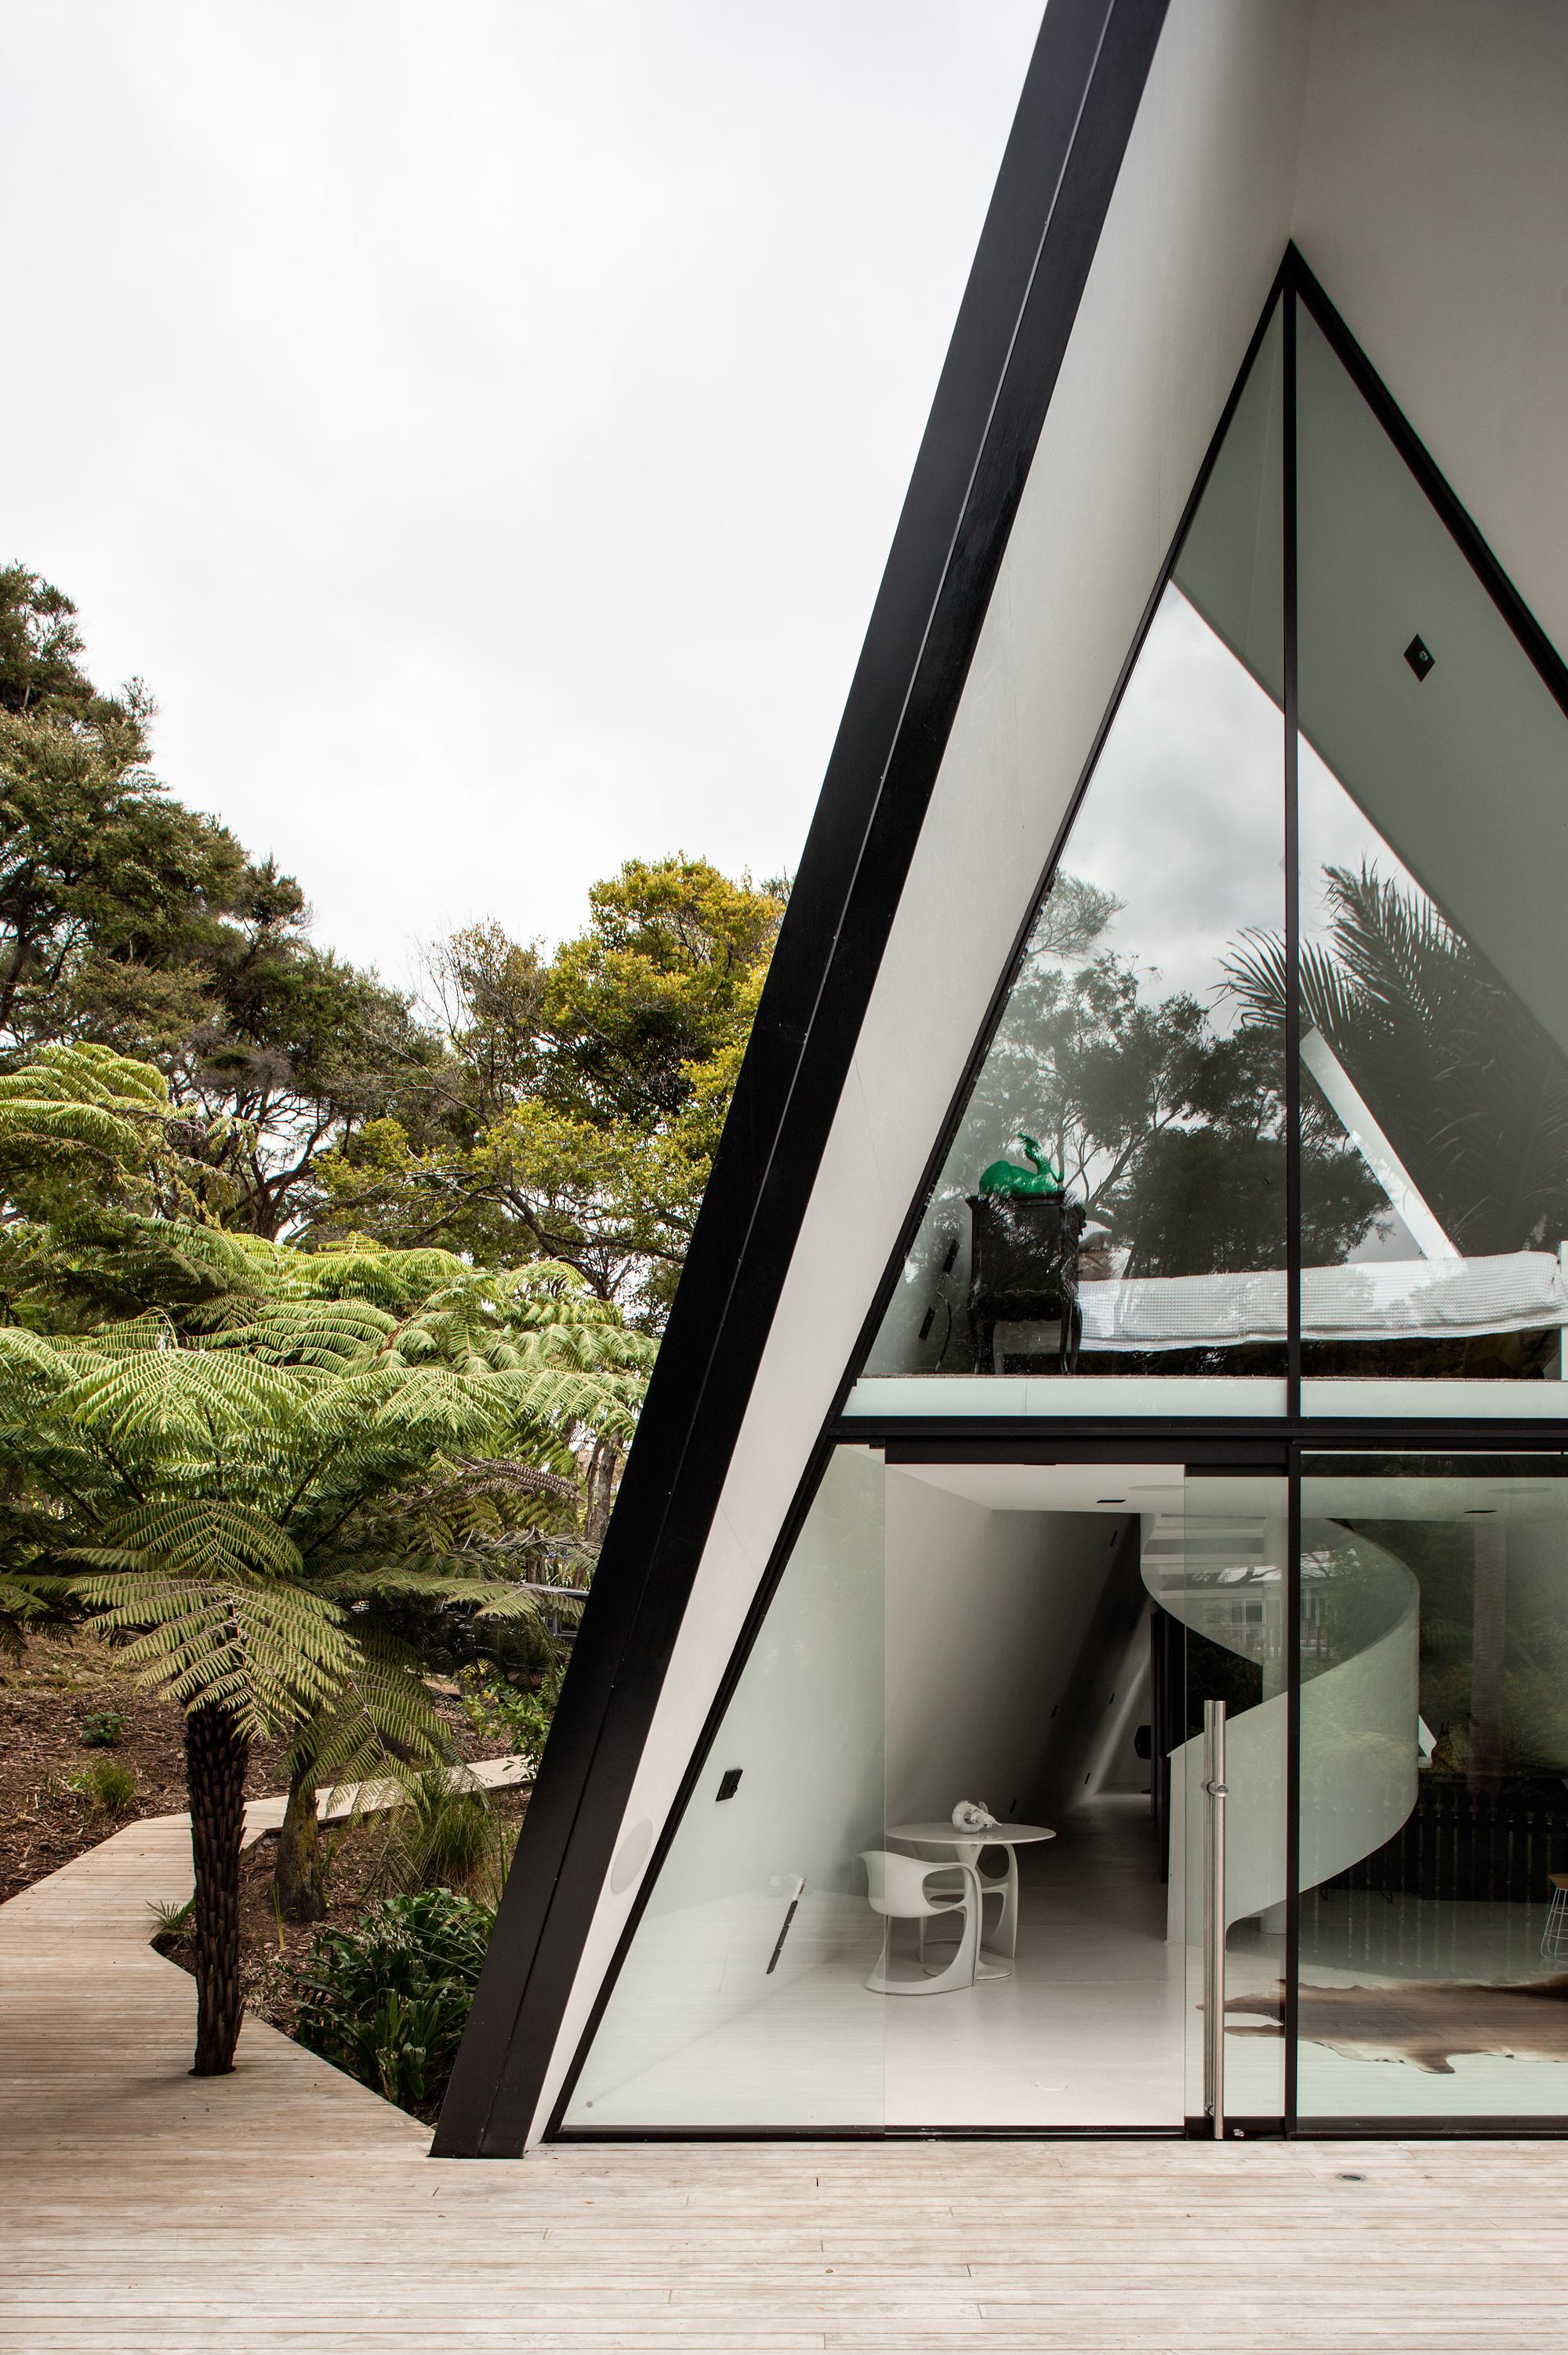 Casa Carpa / Chris Tate Architecture